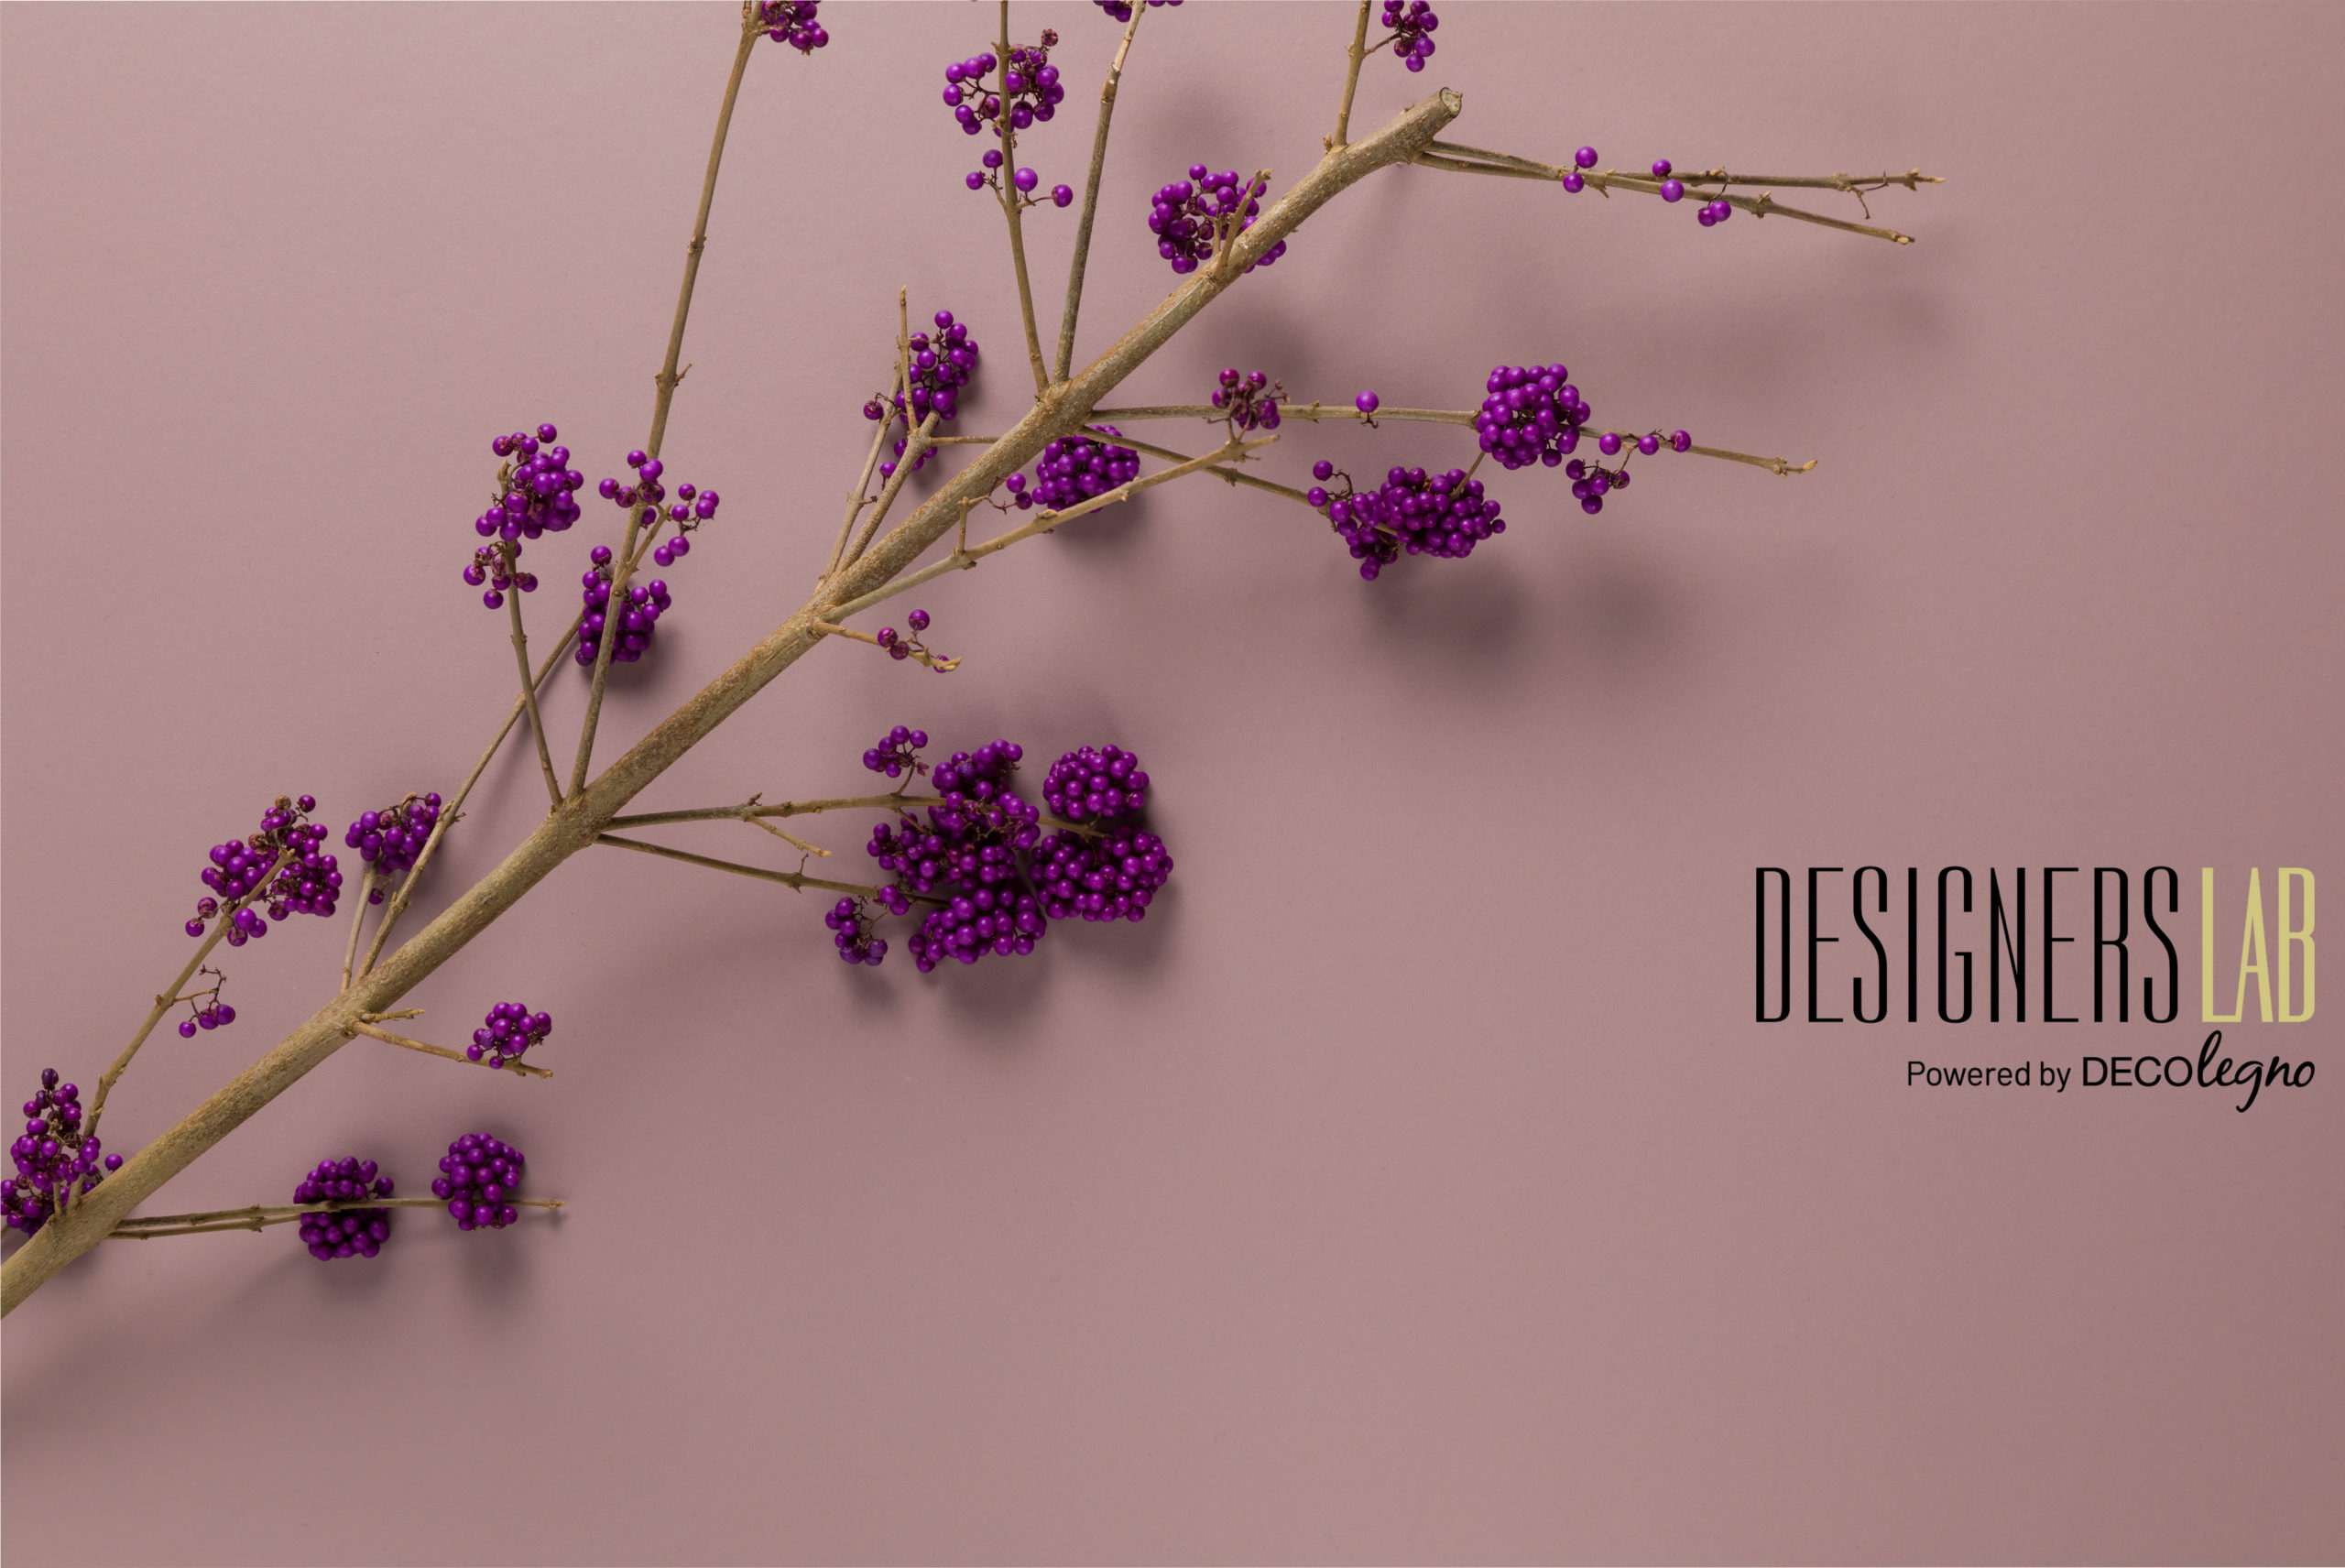 Designers Lab Ovatta collectie